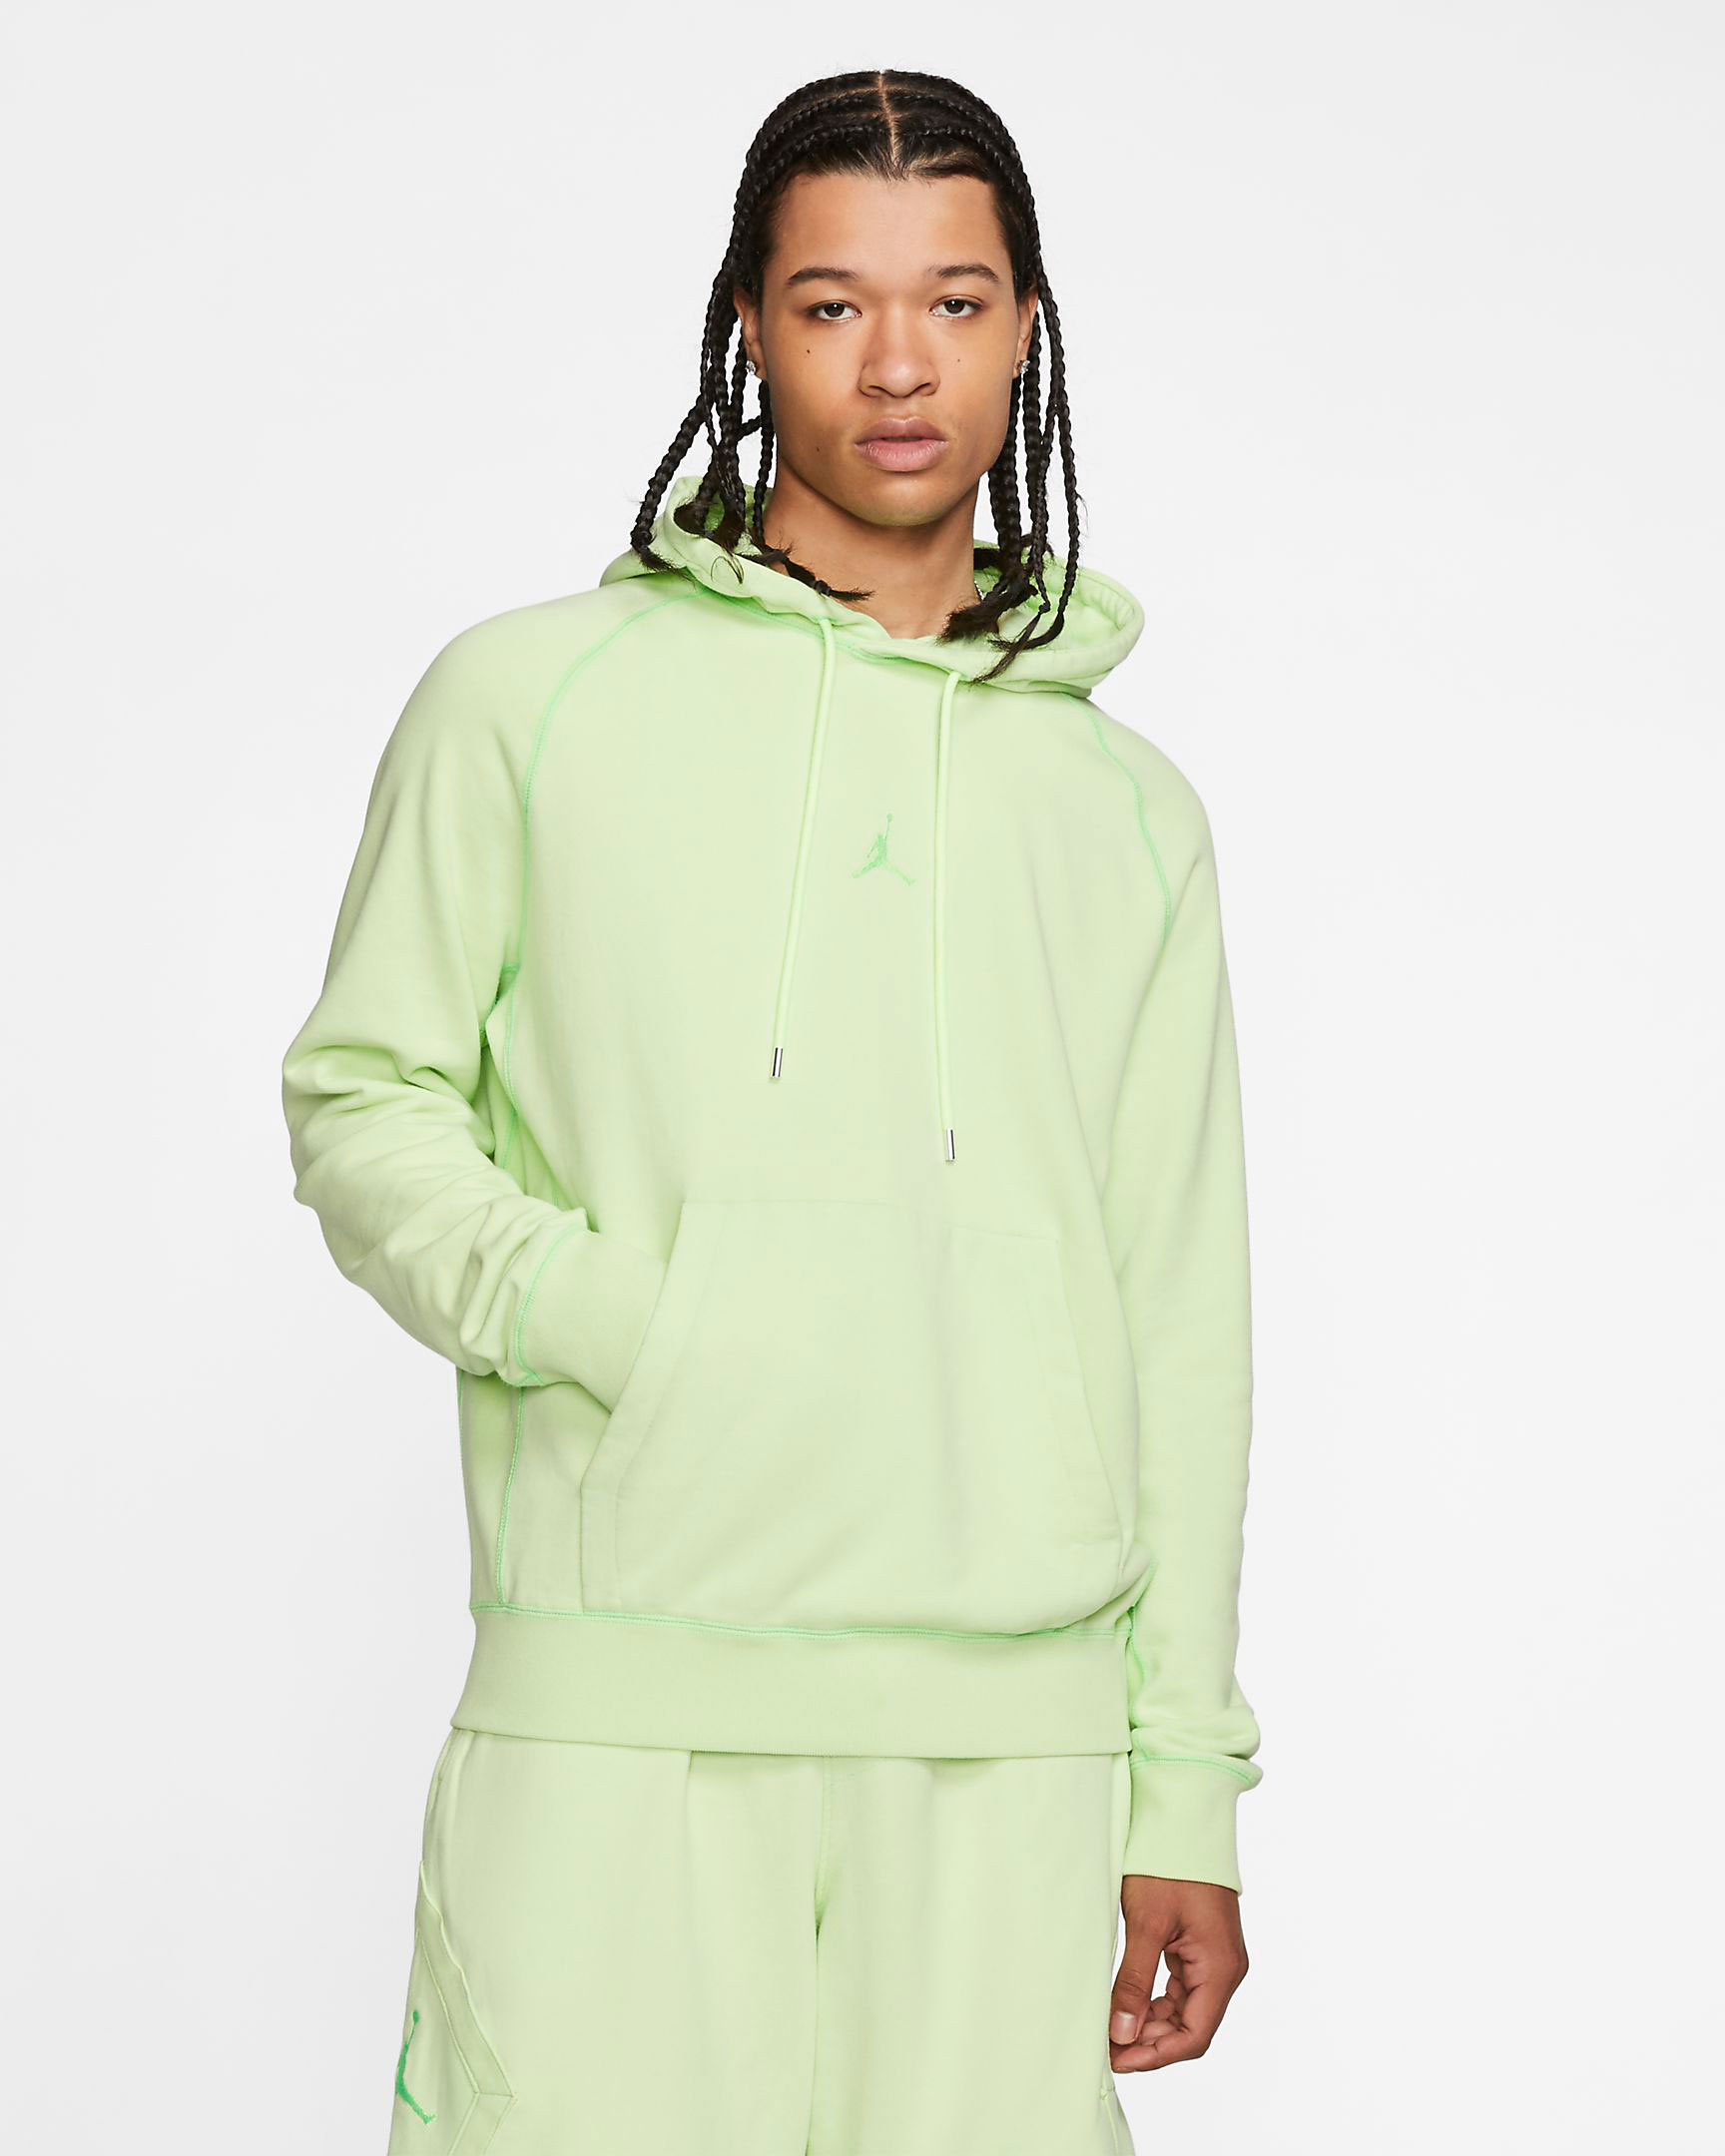 jordan-1-bio-hack-hoodie-match-green